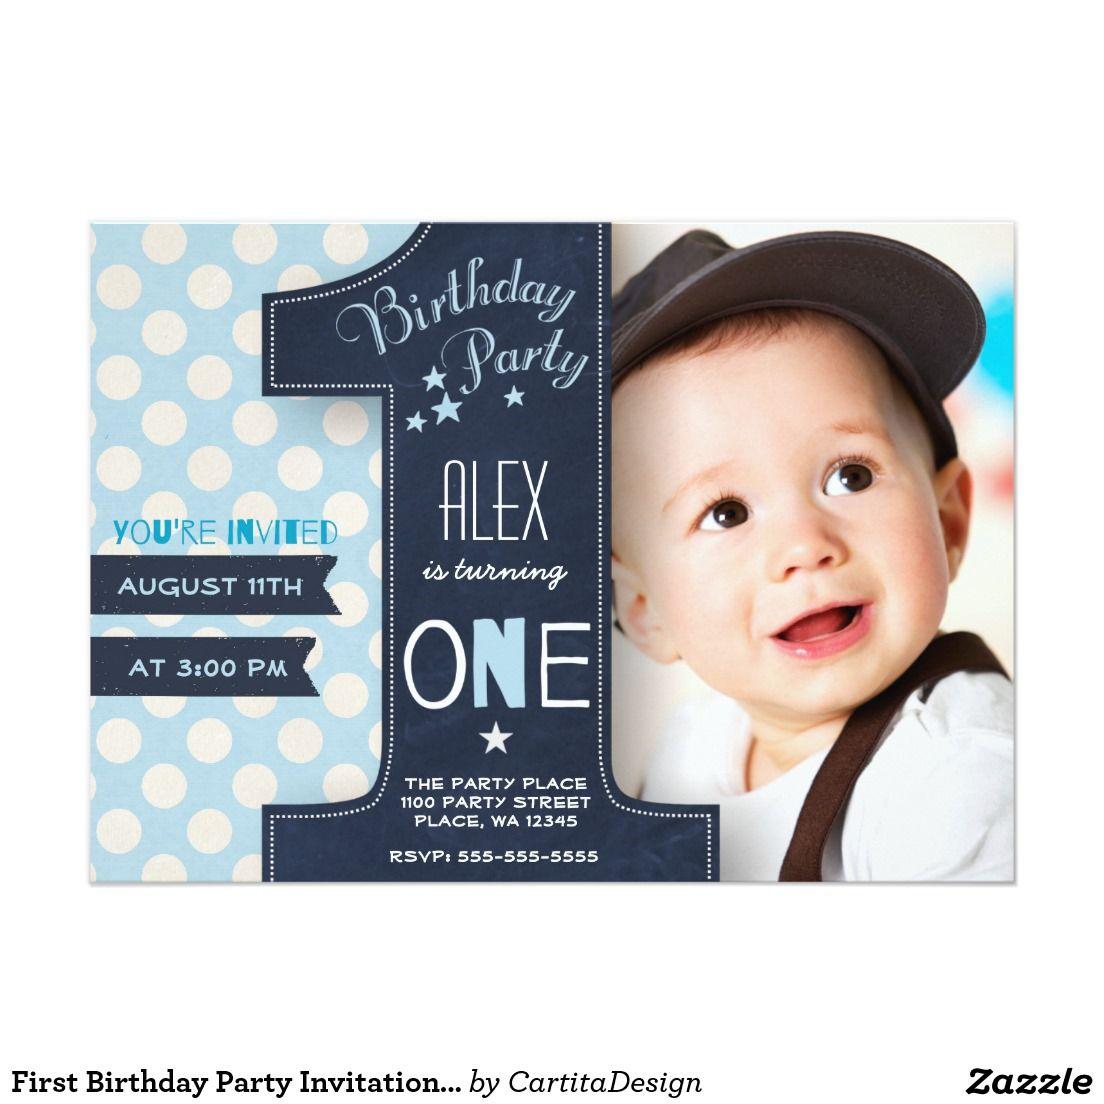 Boy birthday invitation chalkboard invitation custom birthday invitation photo invitation custom printable invite first birthday boy invite